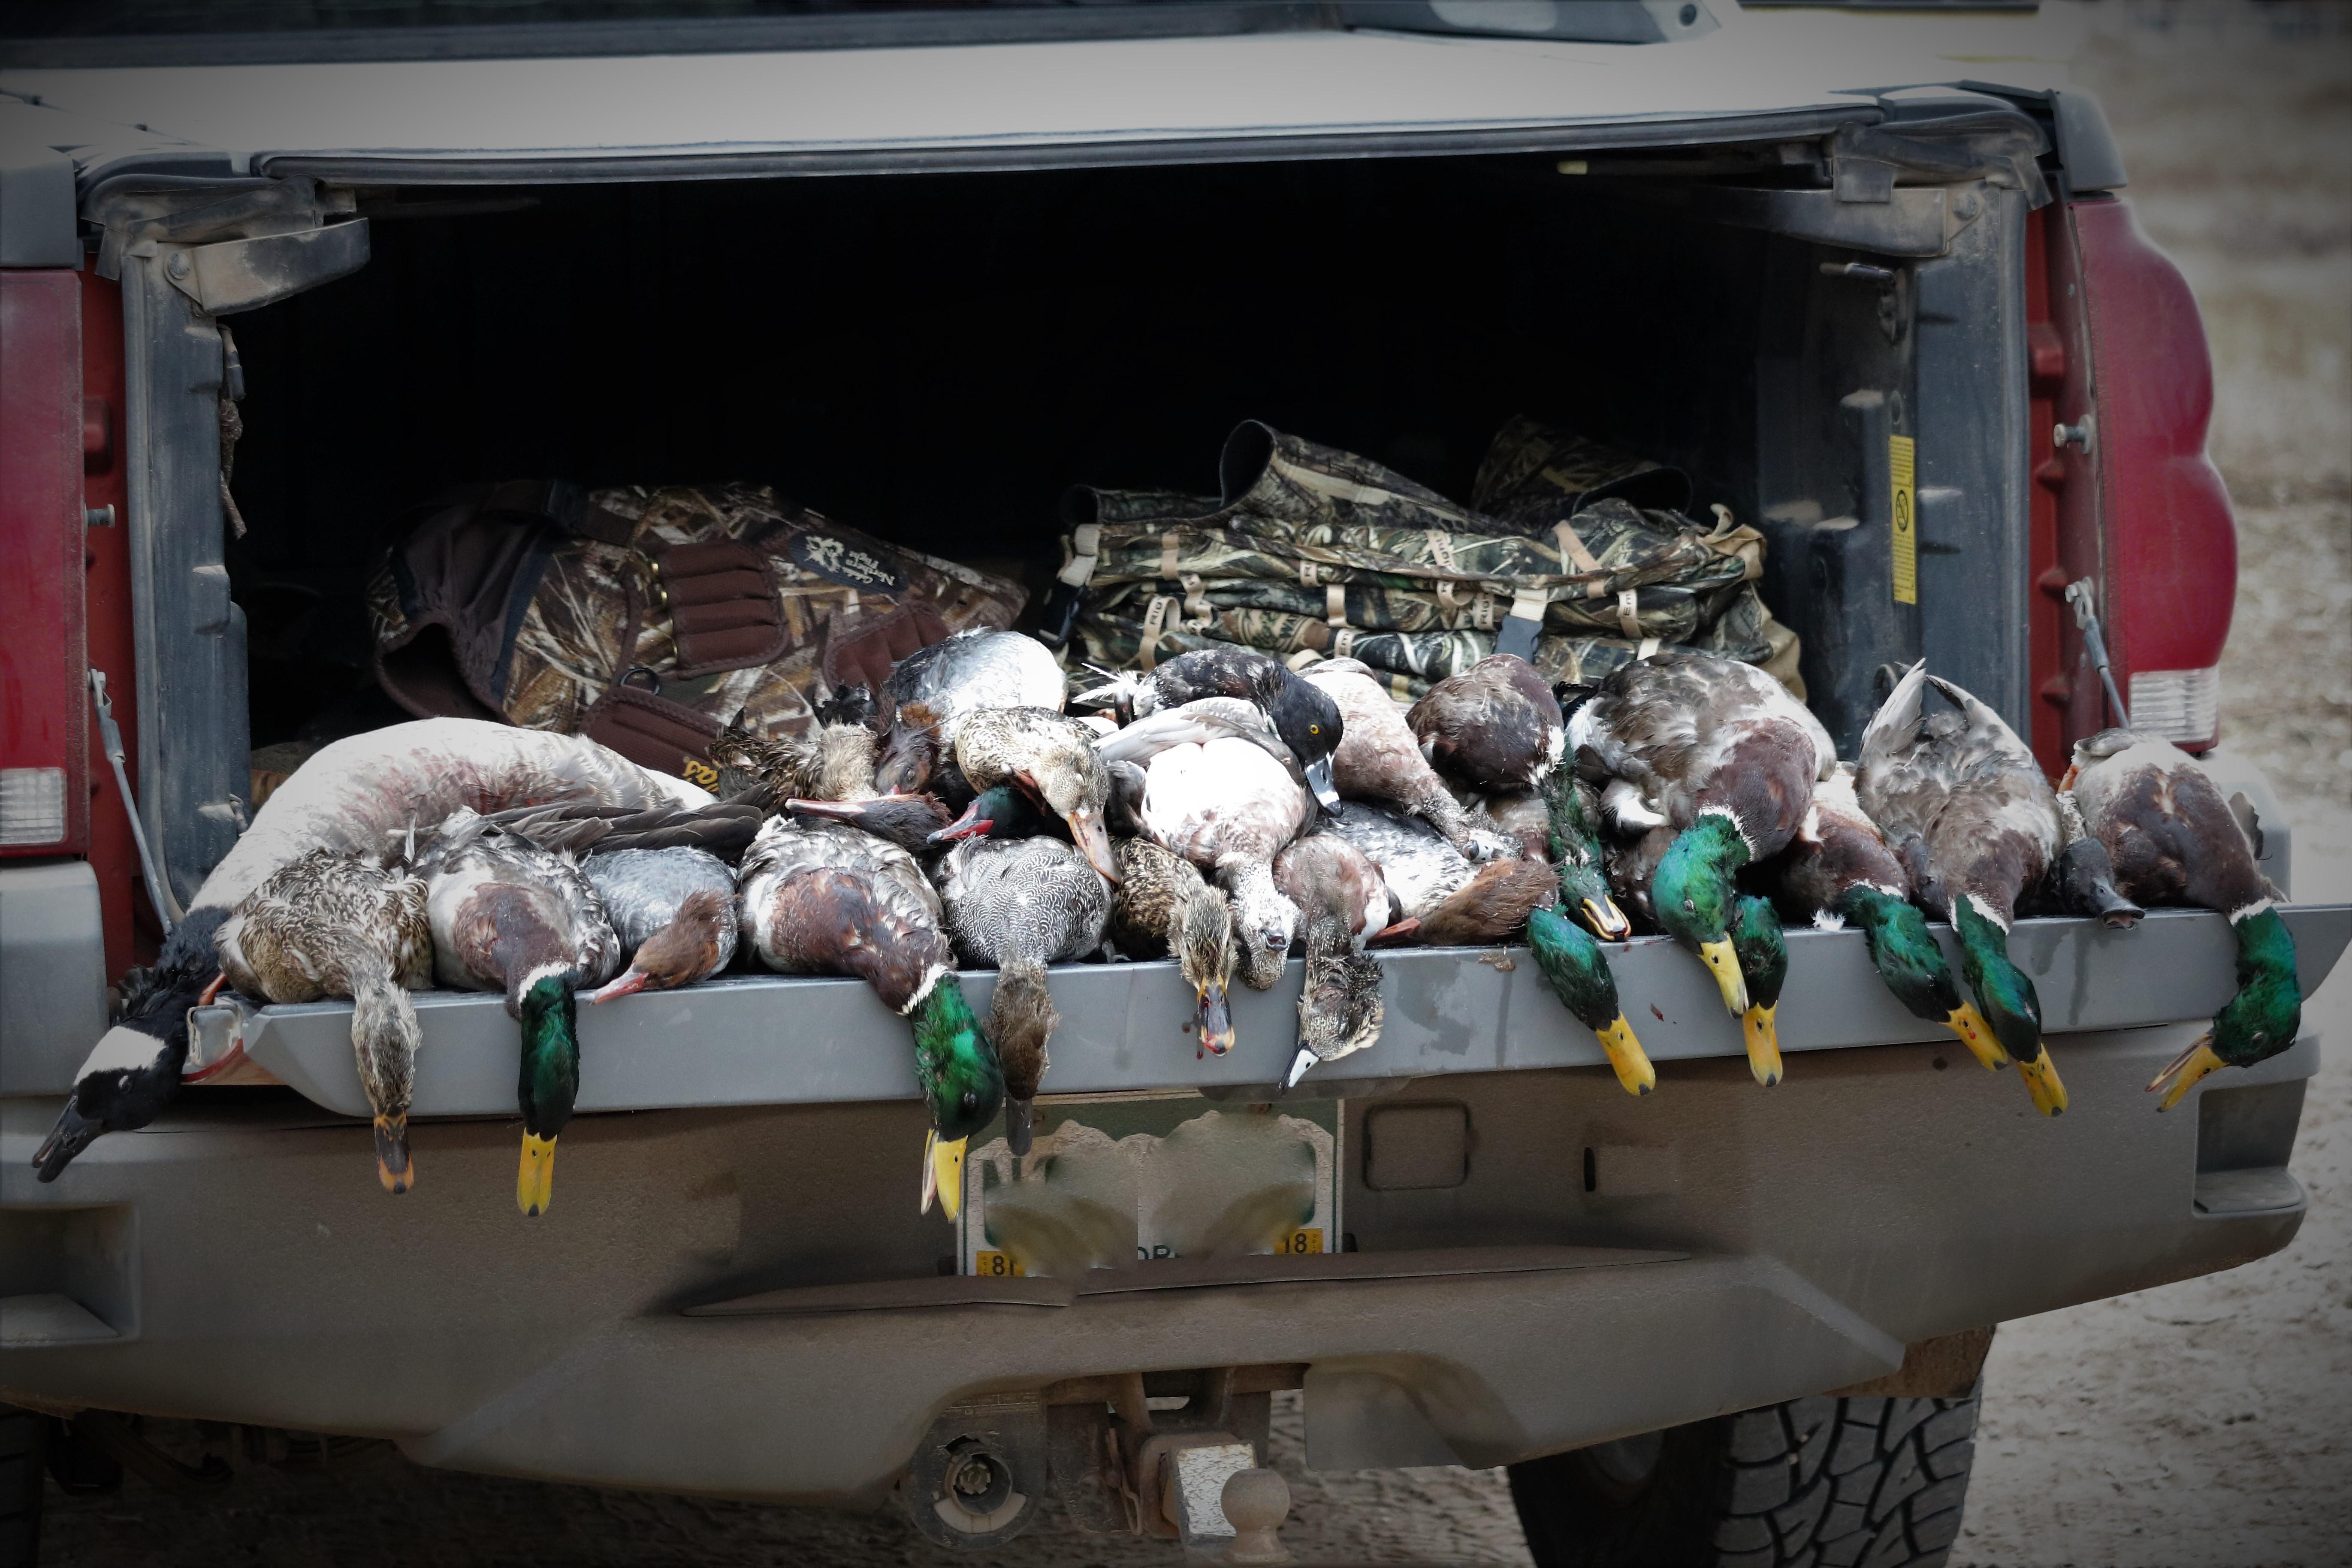 A Truckload of Ducks